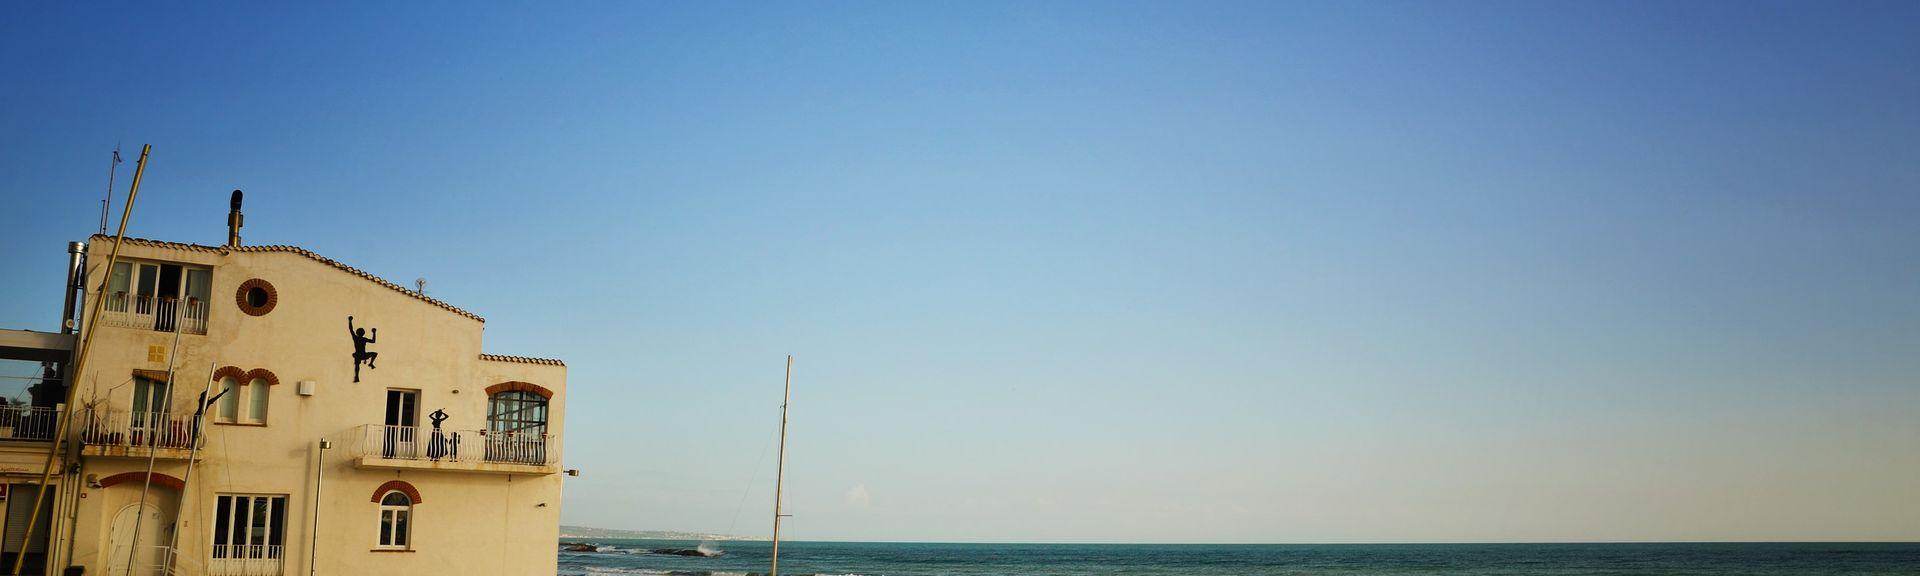 Marina di Ragusa, Ragusa, Sizilien, Italien